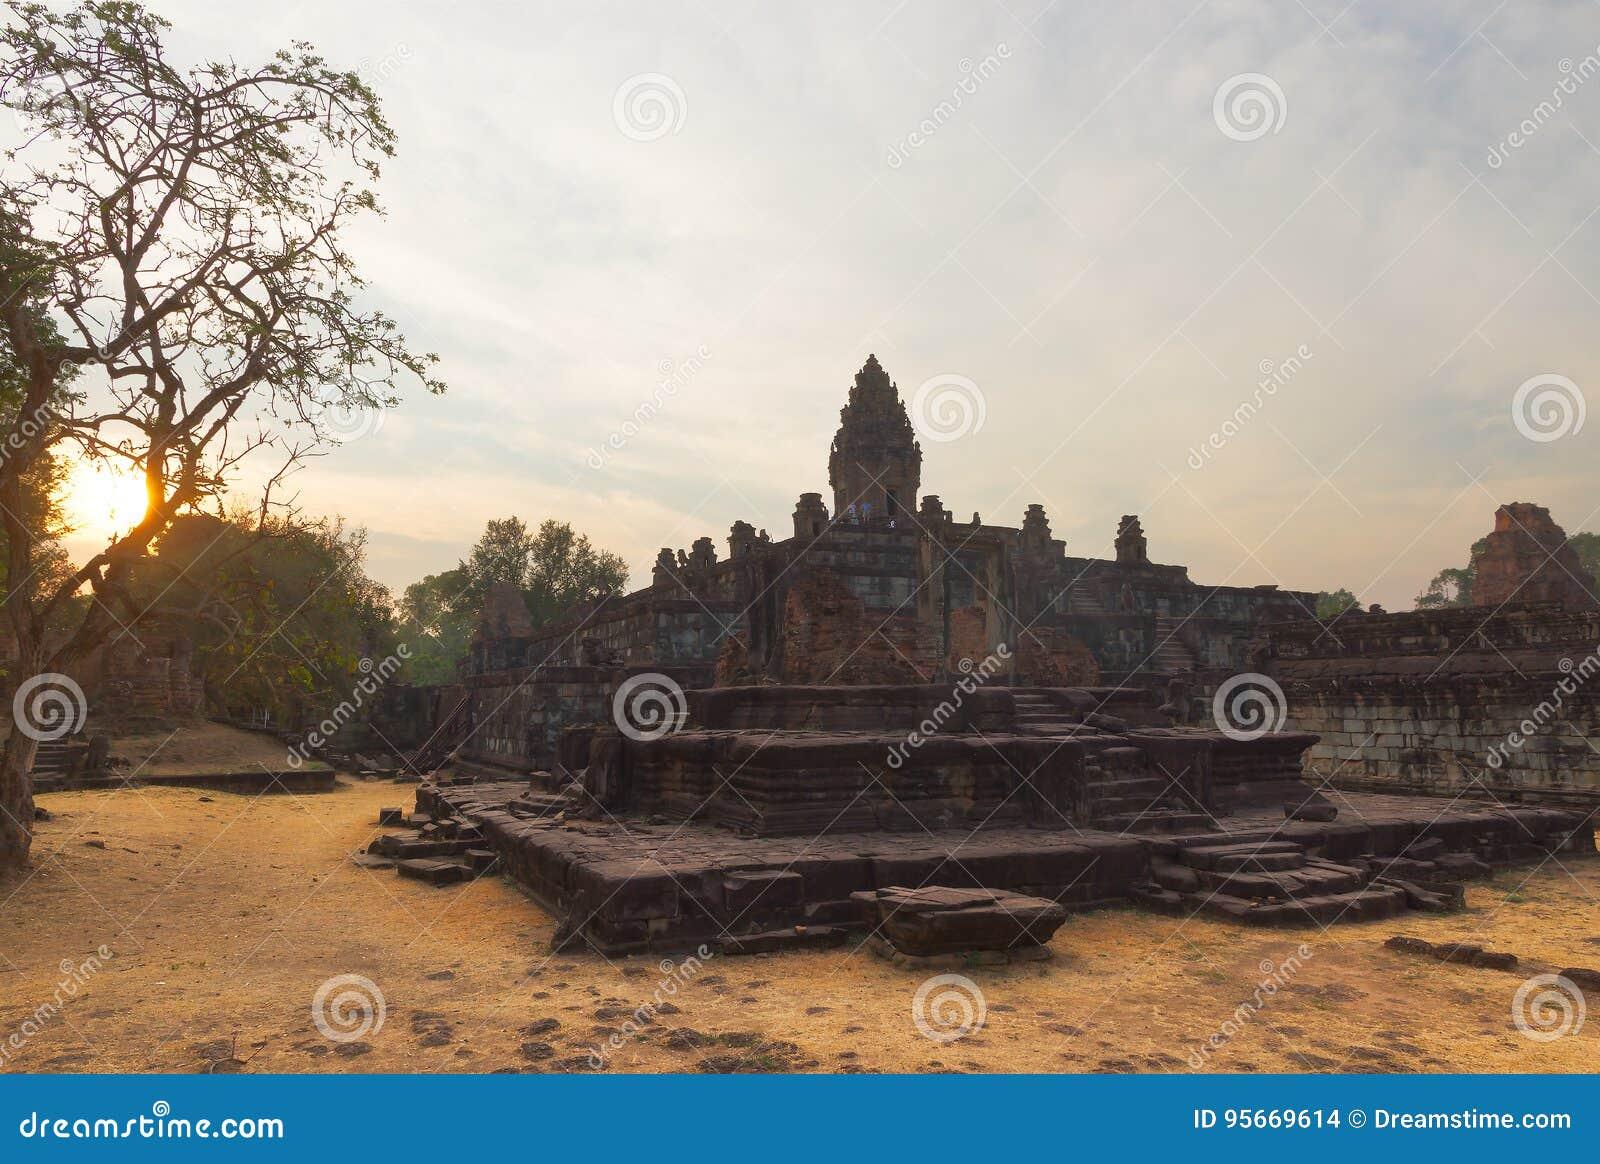 Tempel Prasat Bakong, Kambodscha